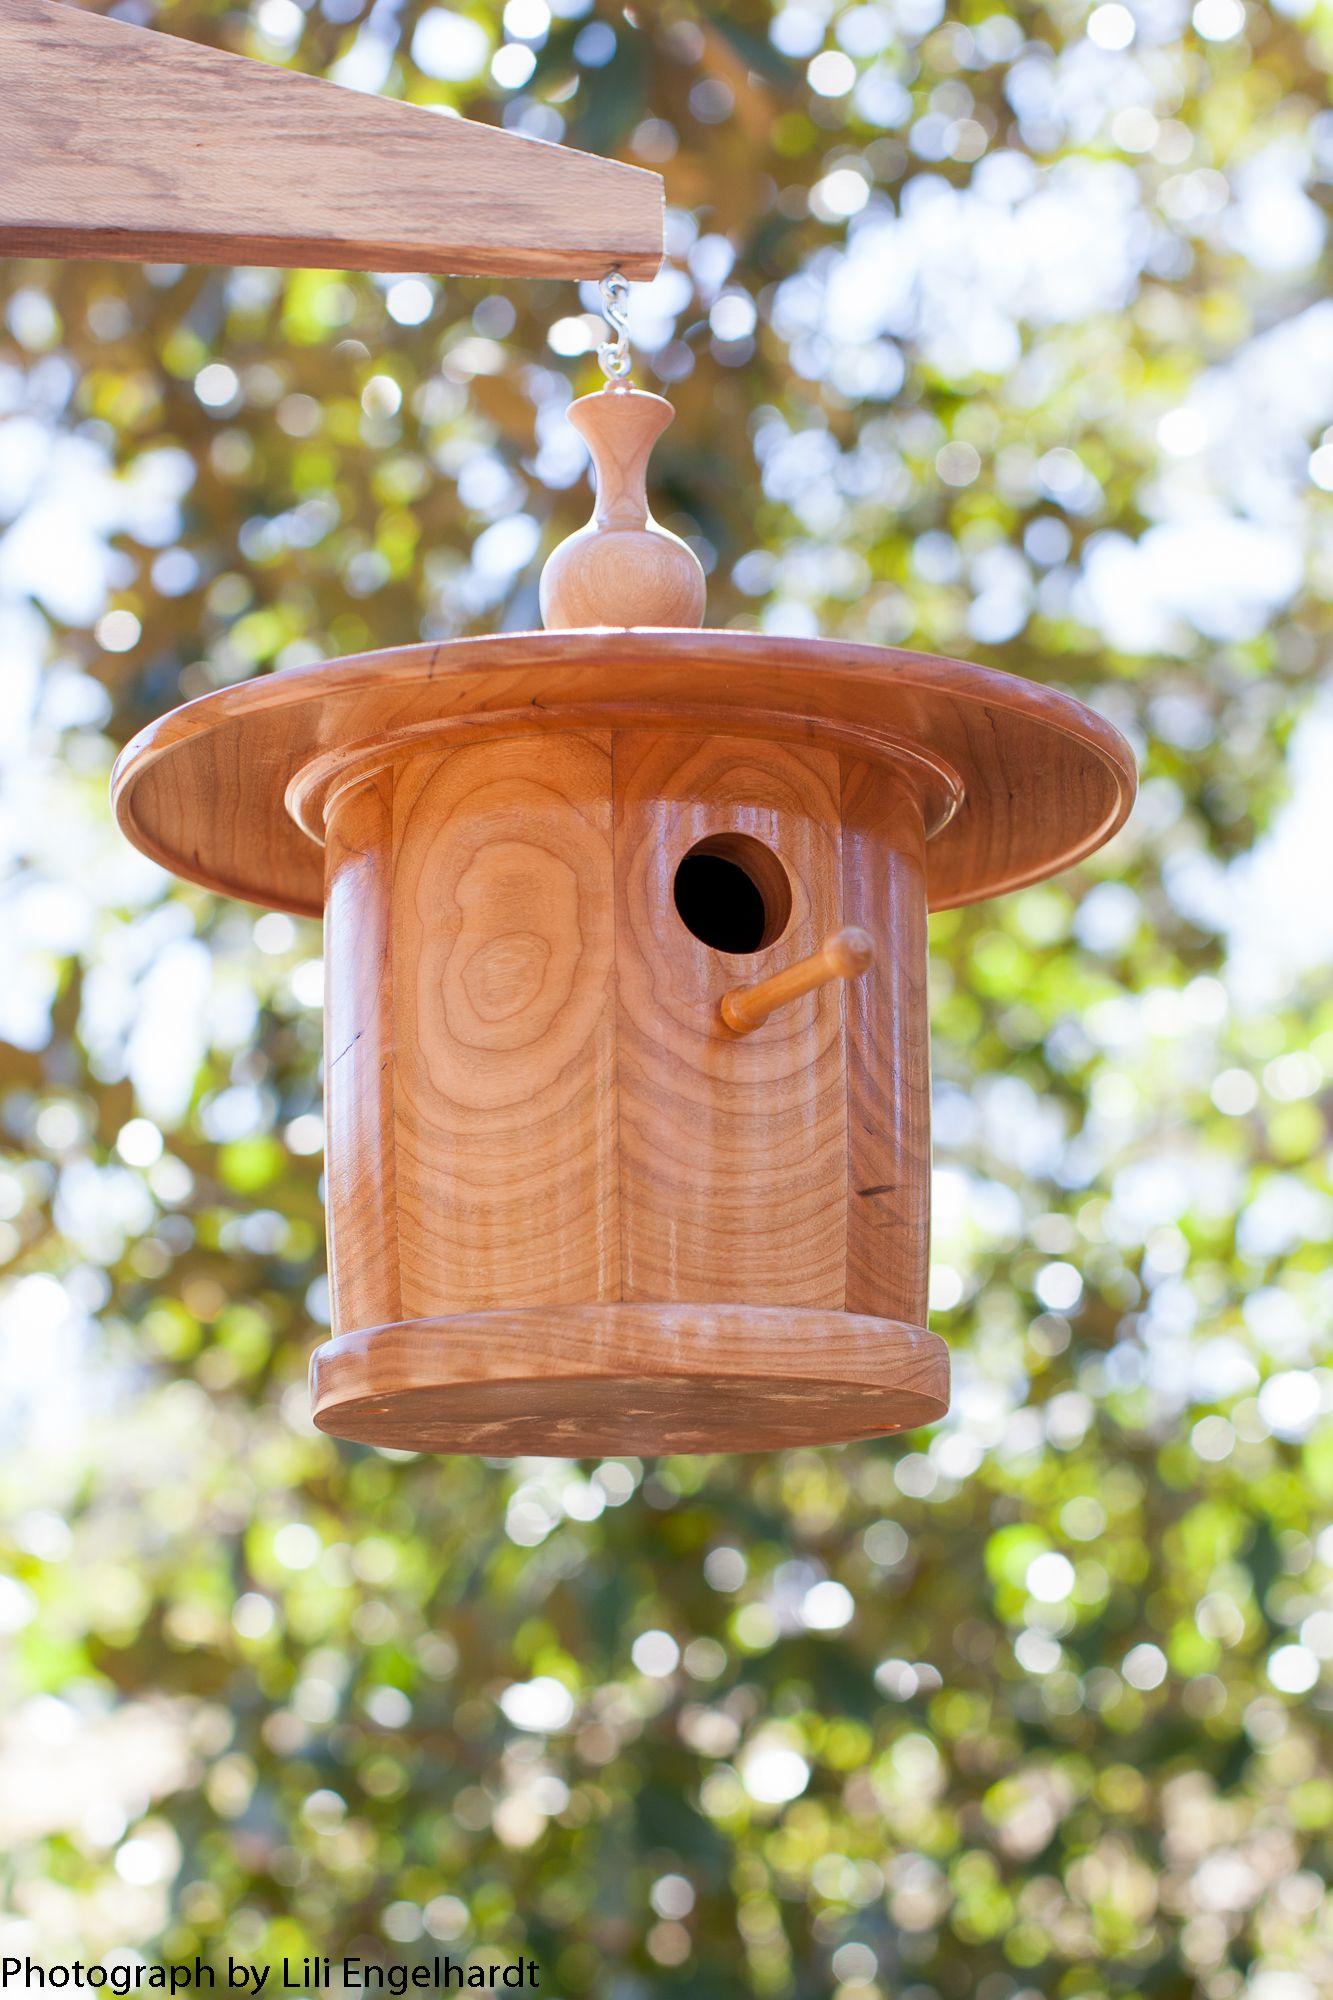 Cherry Zen Songbird House Robert S Shuping Wood Works The